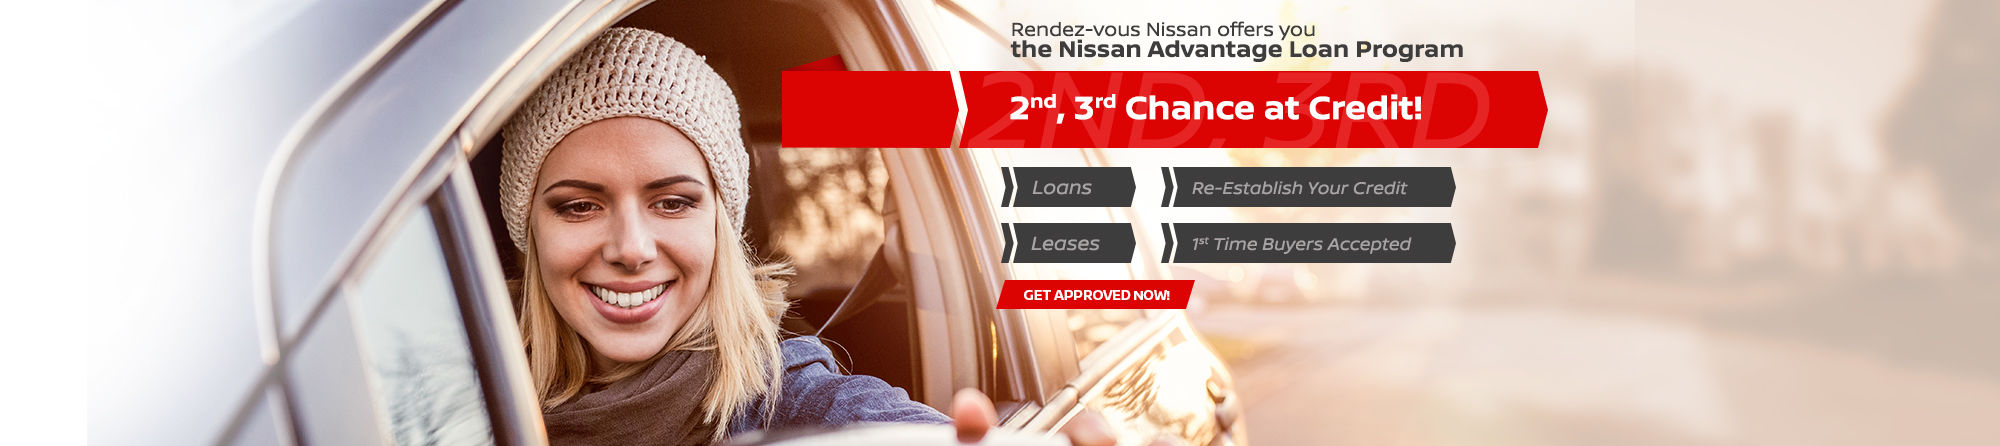 the Nissan Advantage Loan Program